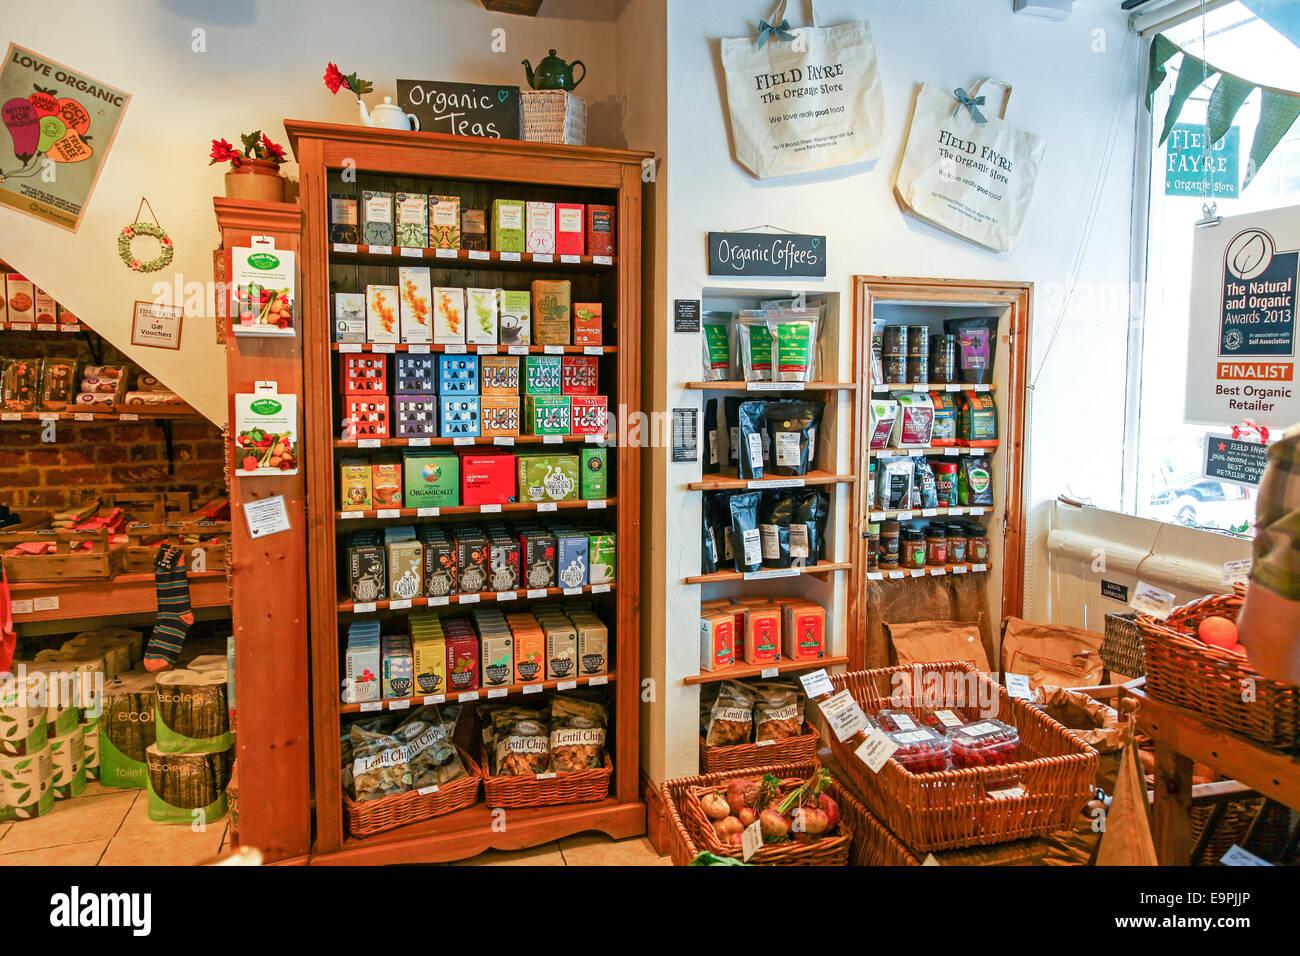 Coffee organic tea - A Display Of Organic Tea And Coffee At Field Fayre Organic Shop Ross On Wye Herefordshire